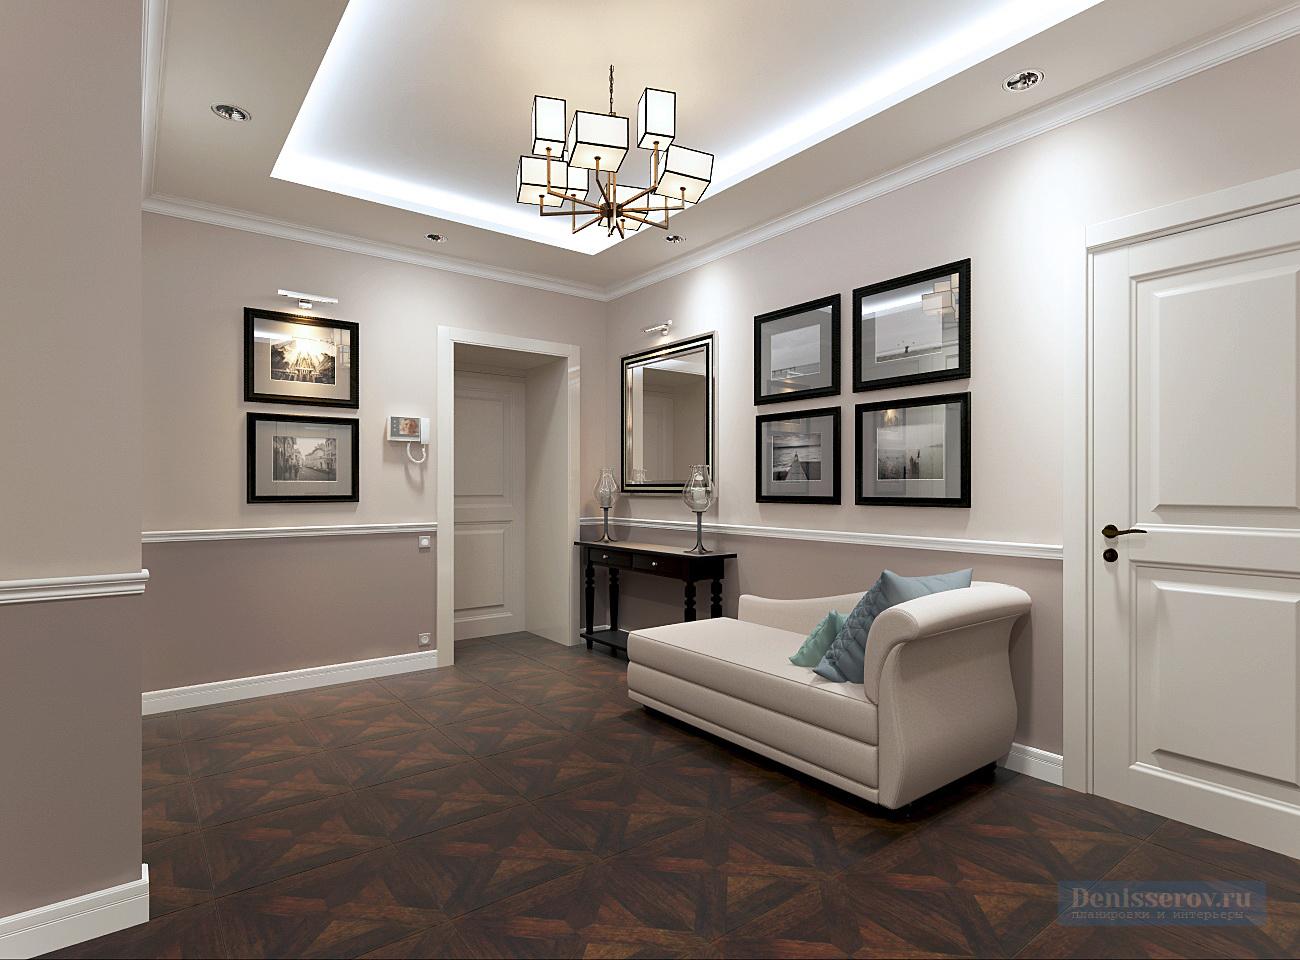 Koridor-holl-v-klassicheskom-stile-20-kv-m-7